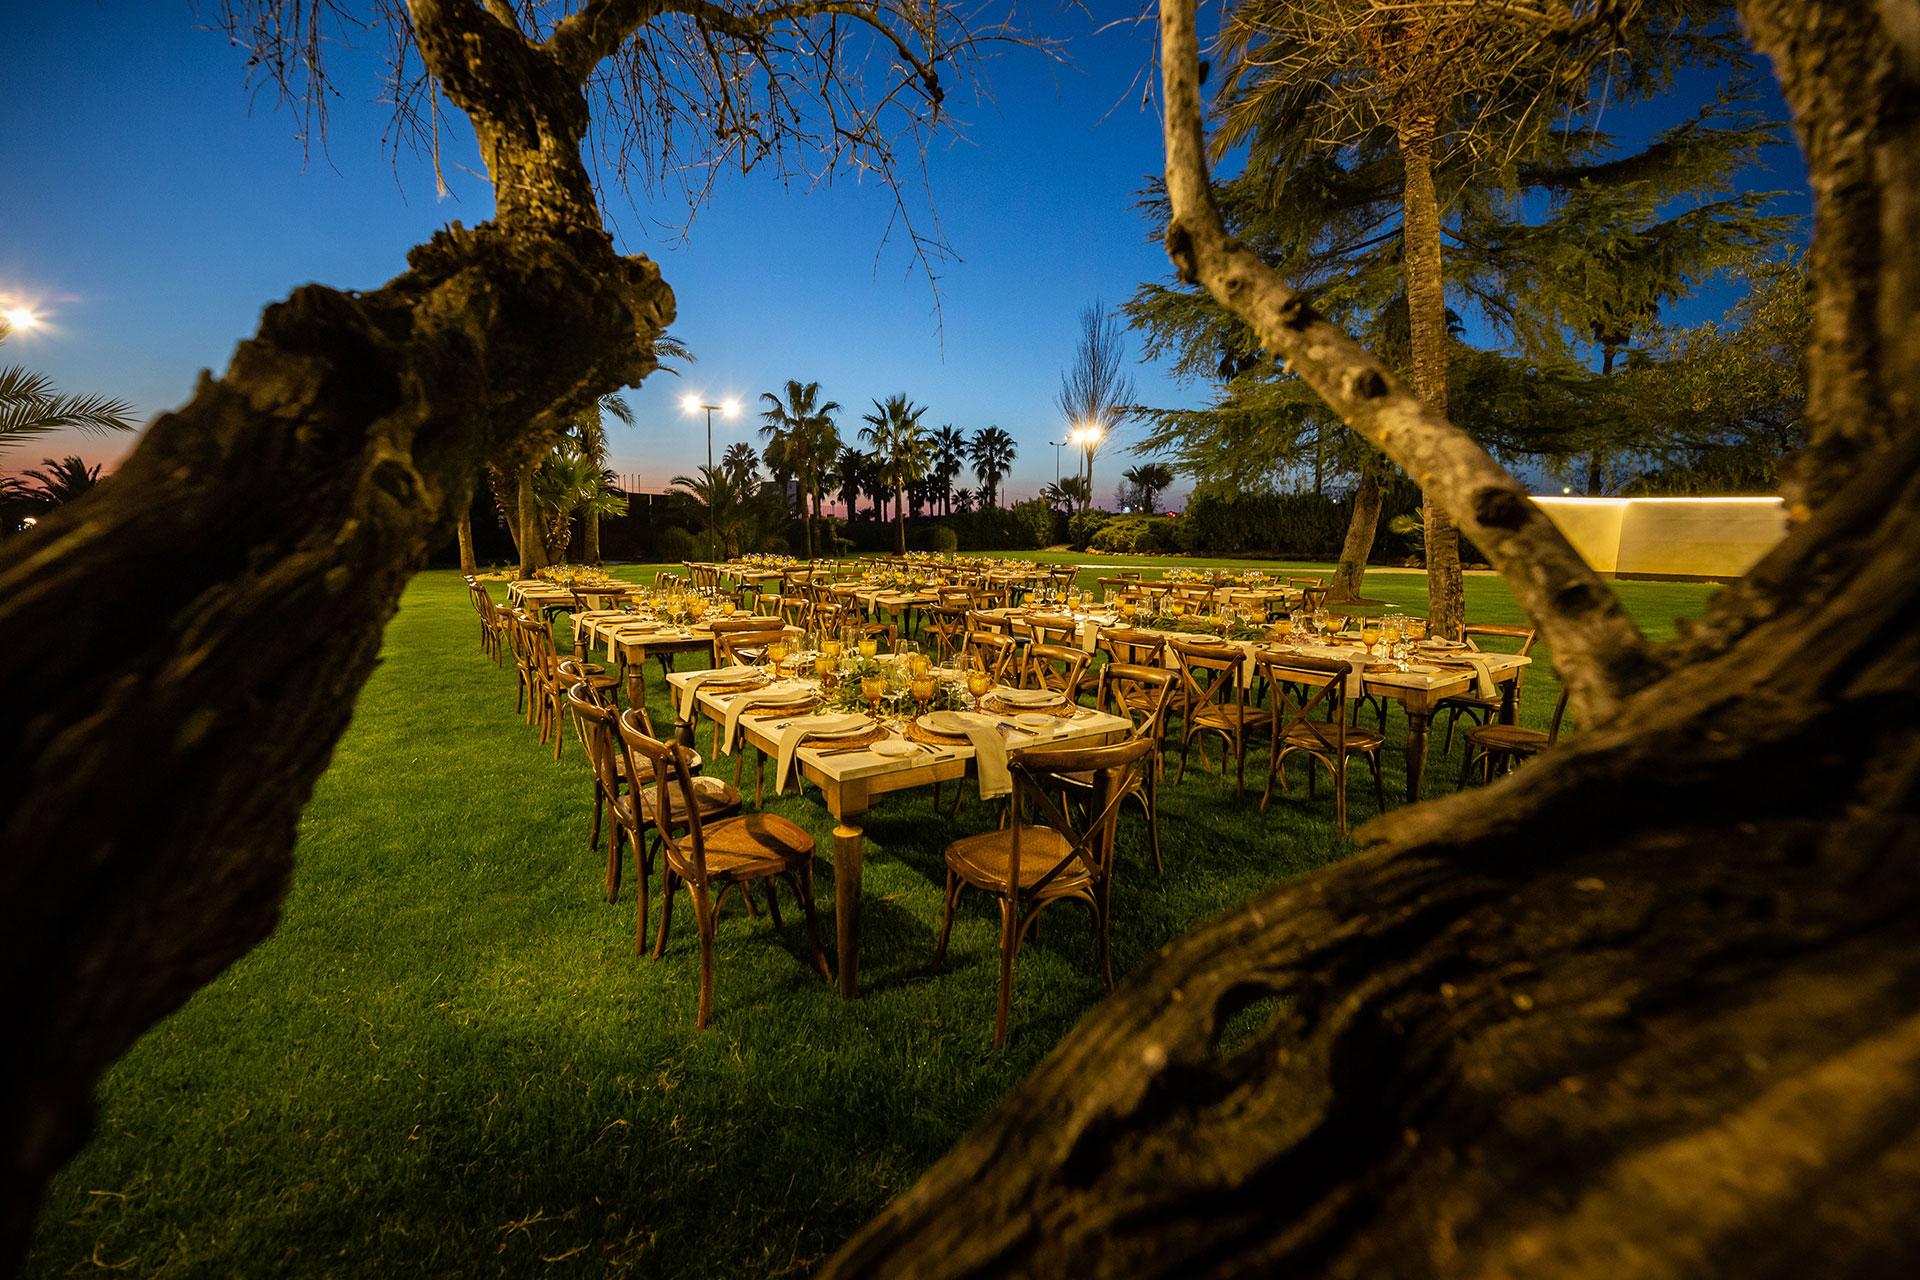 jardin-del-olivar-aralia-3